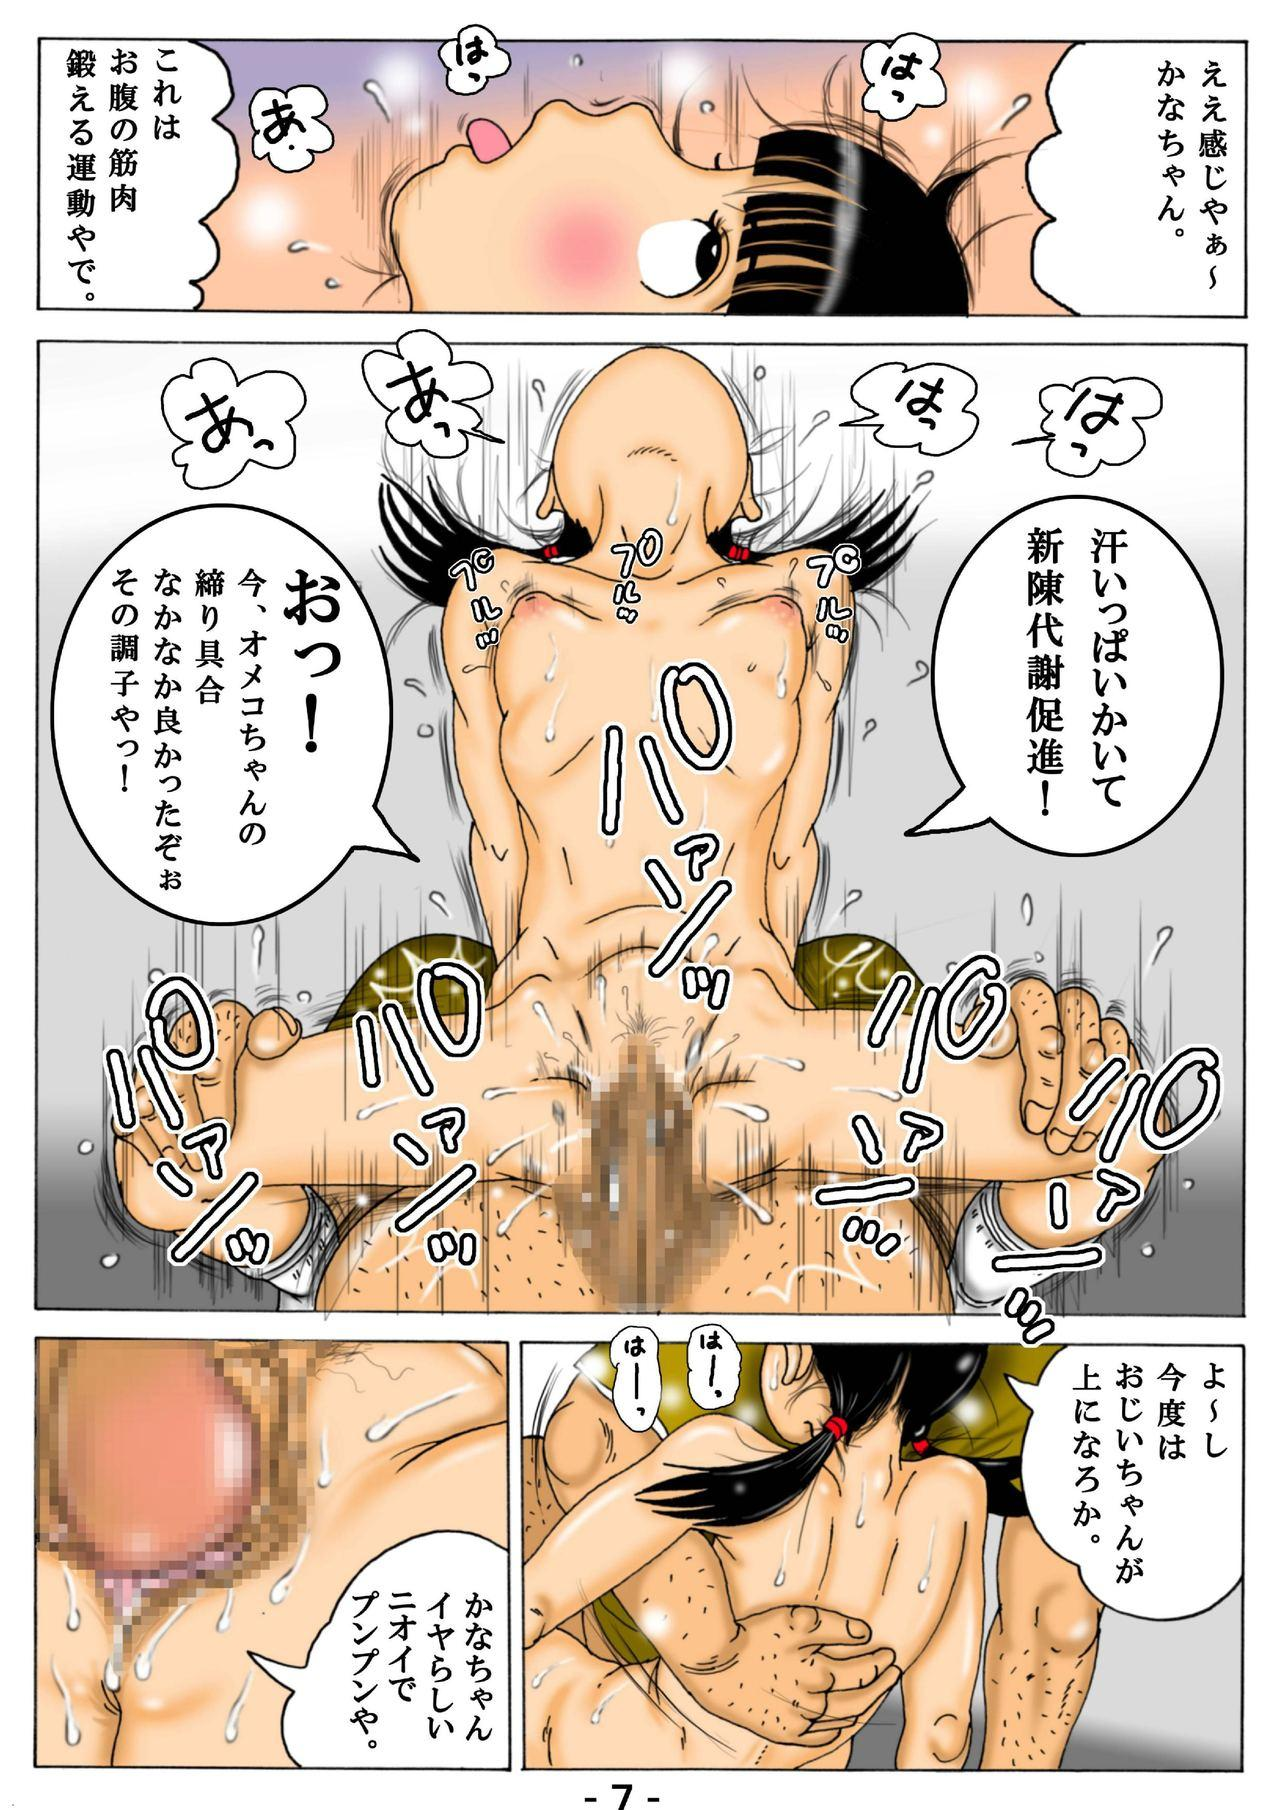 Original Tanpen Manga 2 Hon Date + Original Illust 21